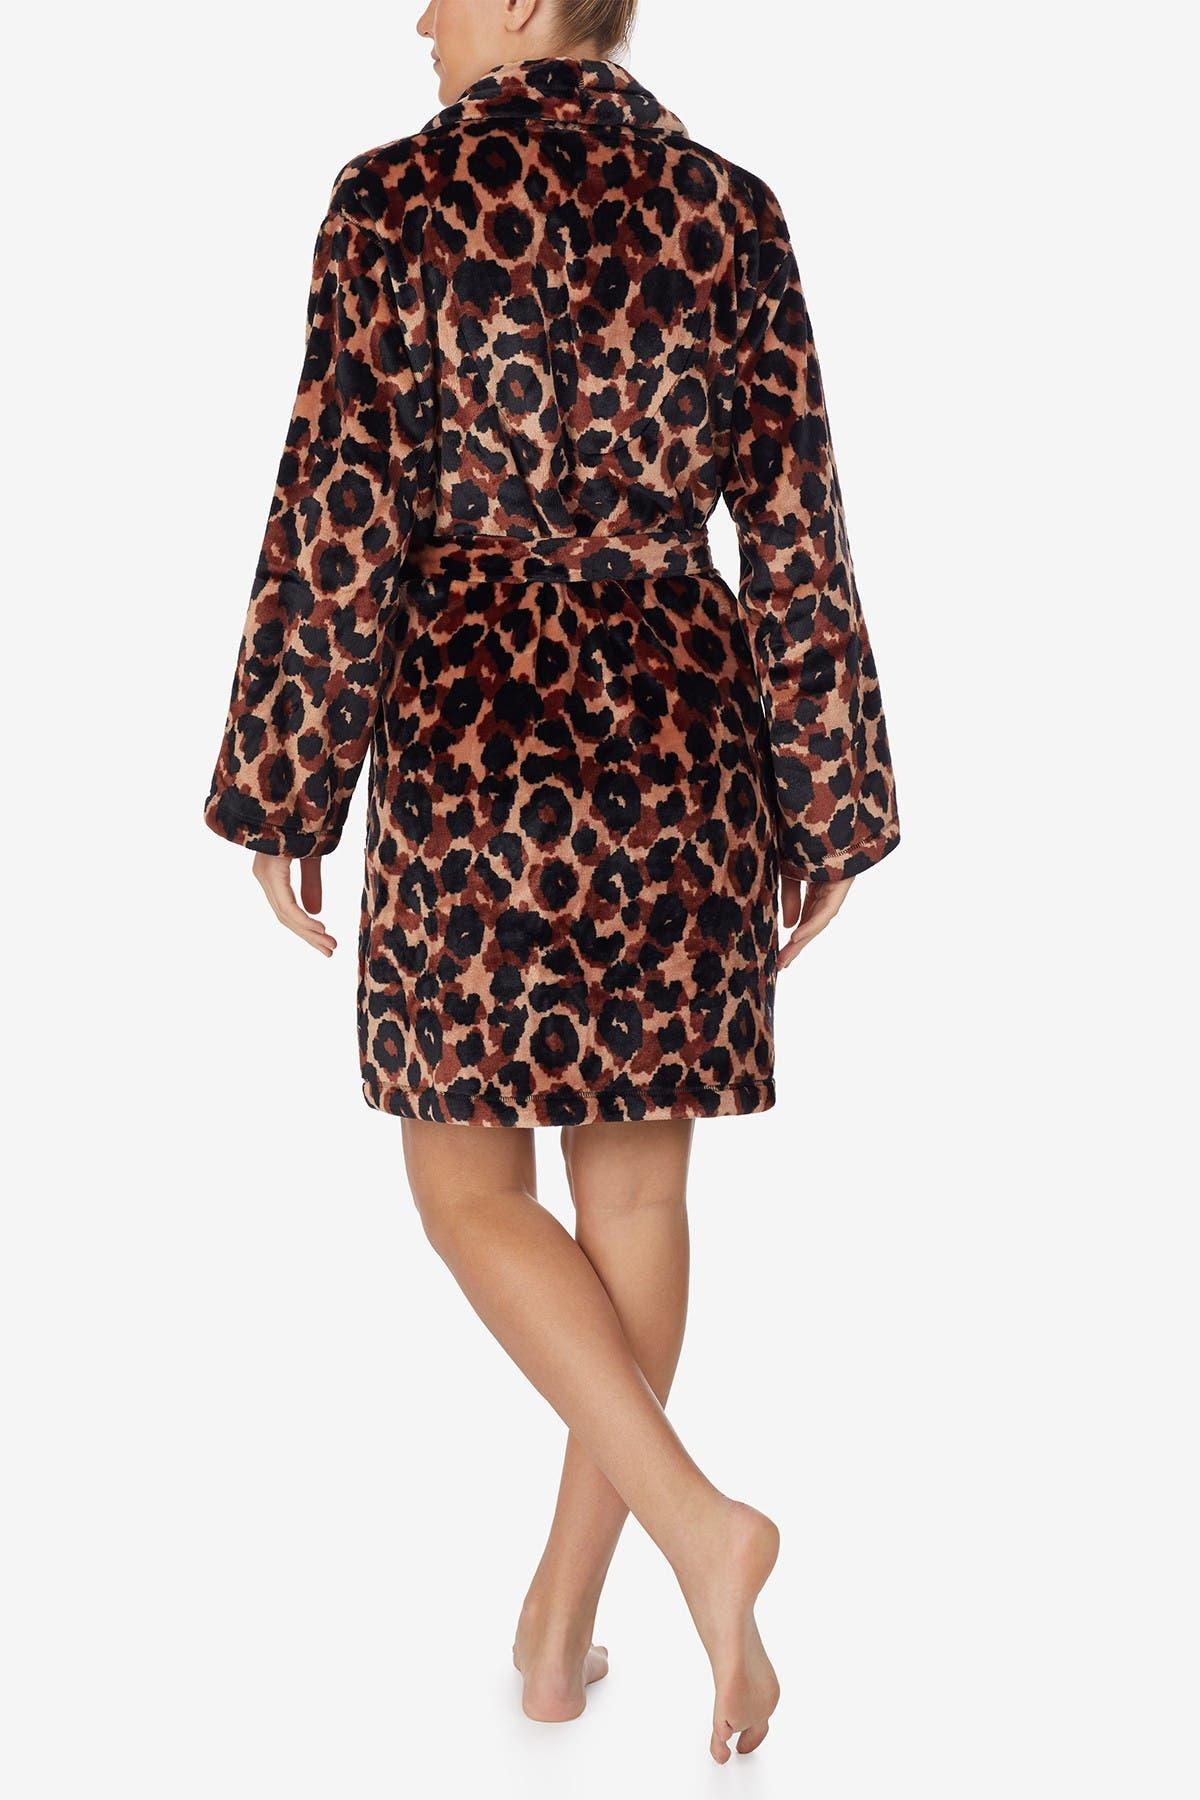 Image of DKNY Long Sleeve Short Wrap Robe